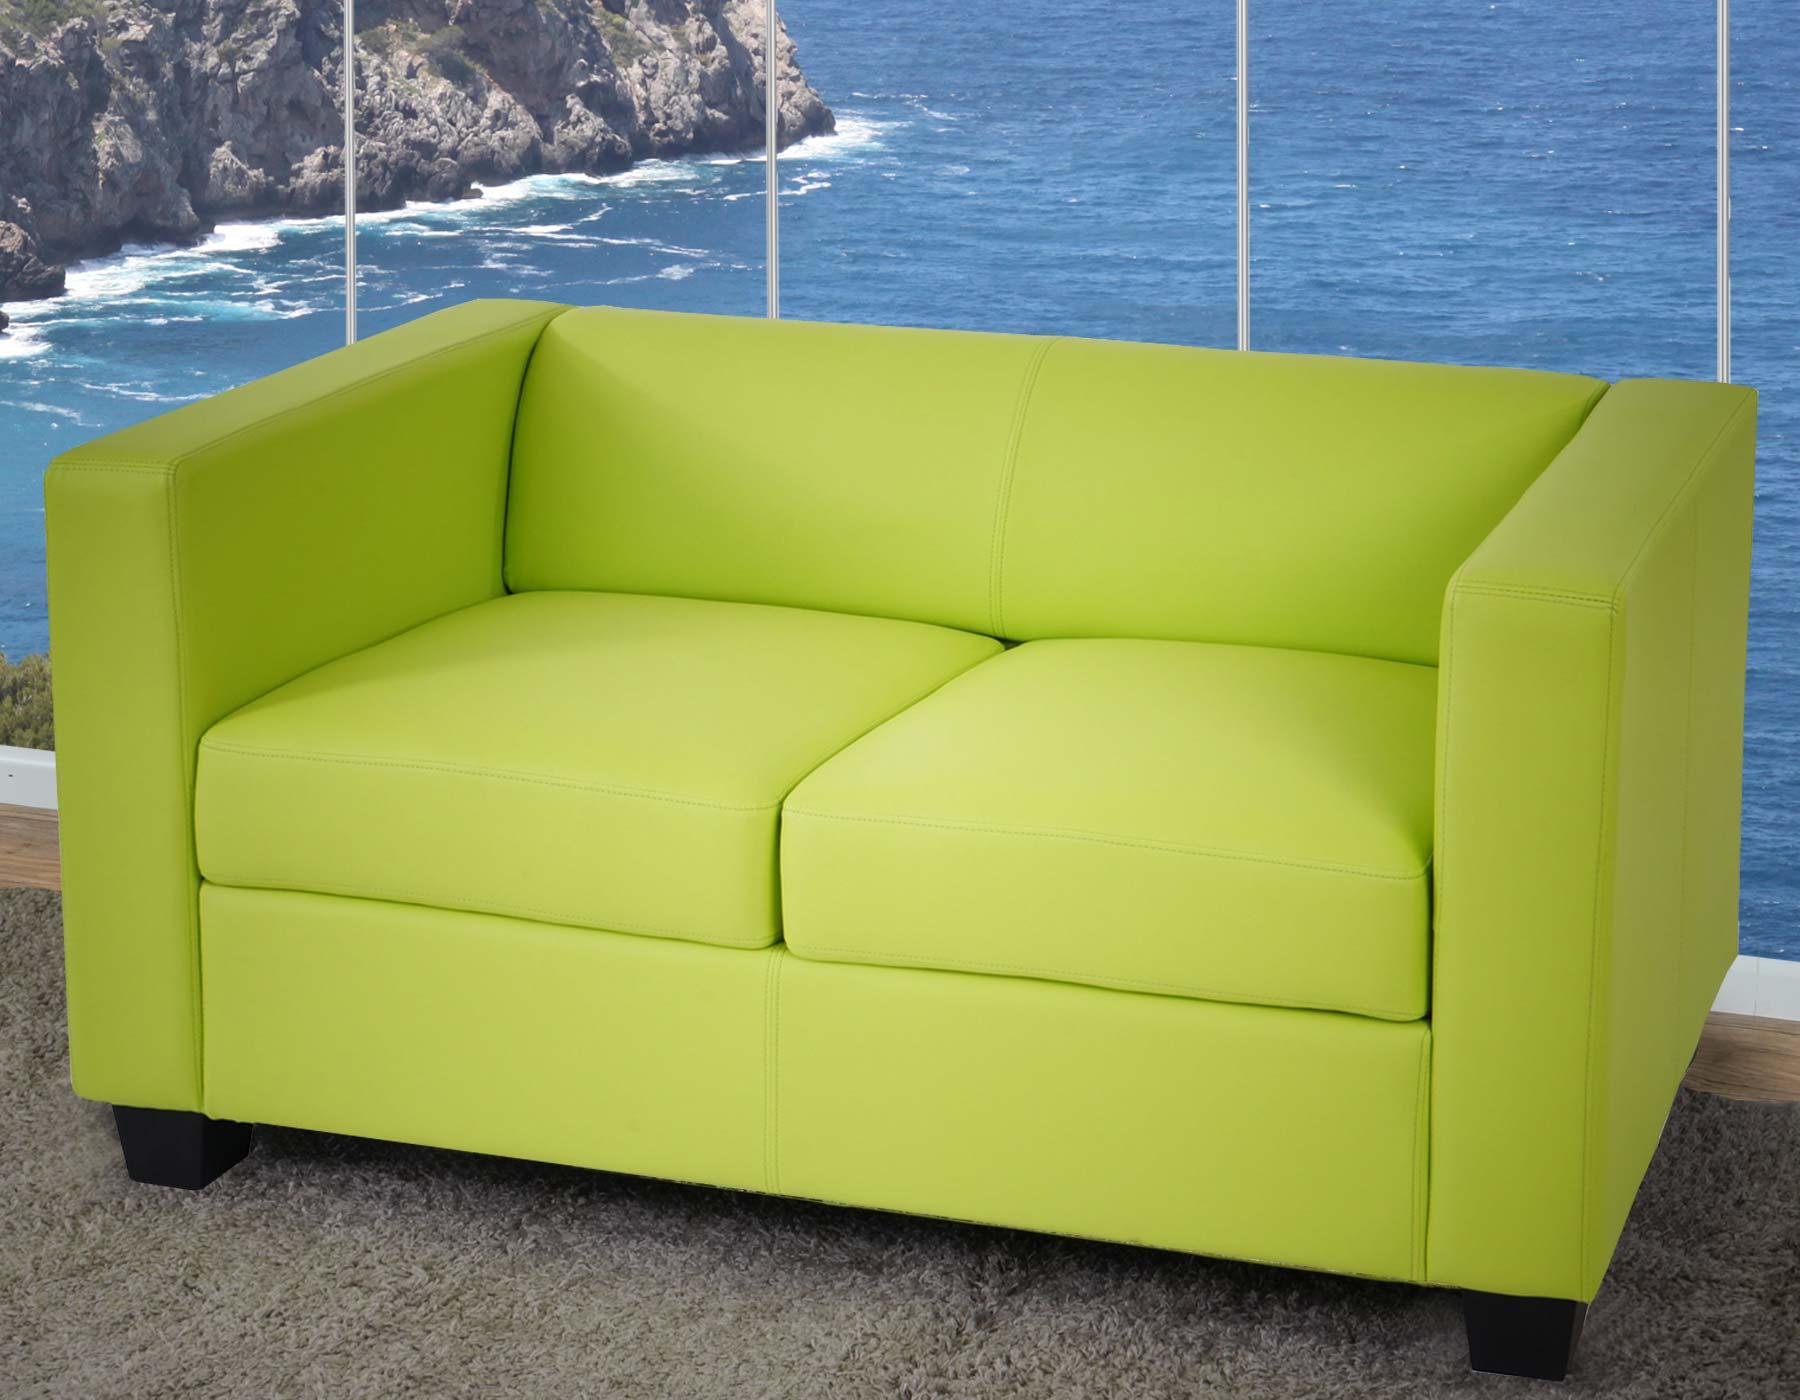 serie lille m65 divano sofa 2 posti 75x137x70cm ecopelle verde ebay. Black Bedroom Furniture Sets. Home Design Ideas